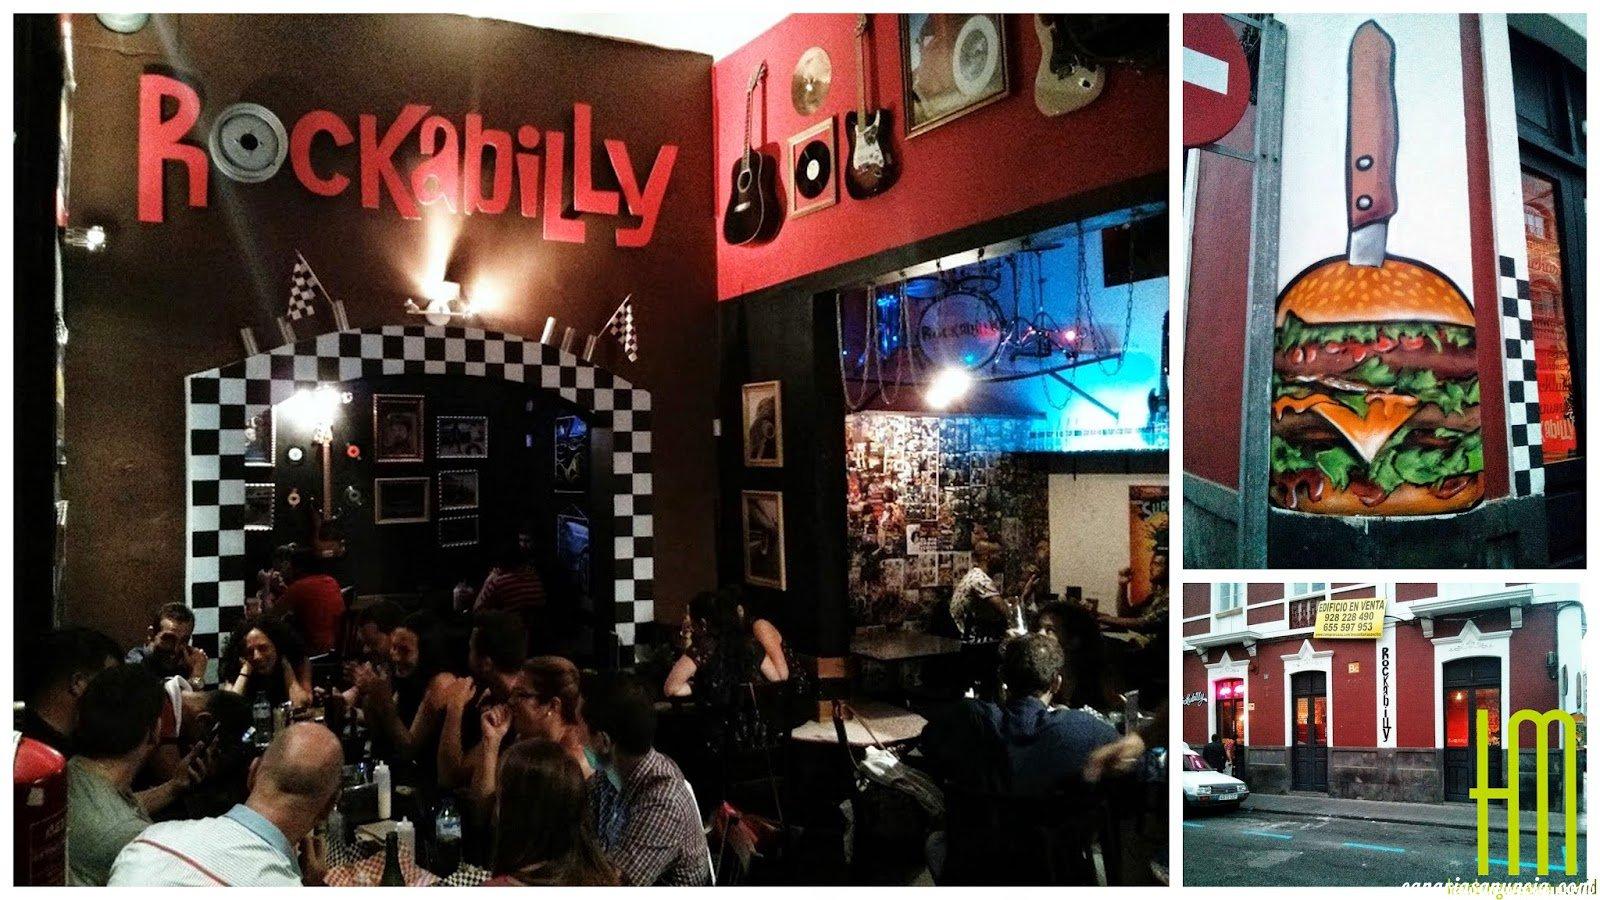 Rockabilly Burger Bar Canalejas - Rockabilly+copy